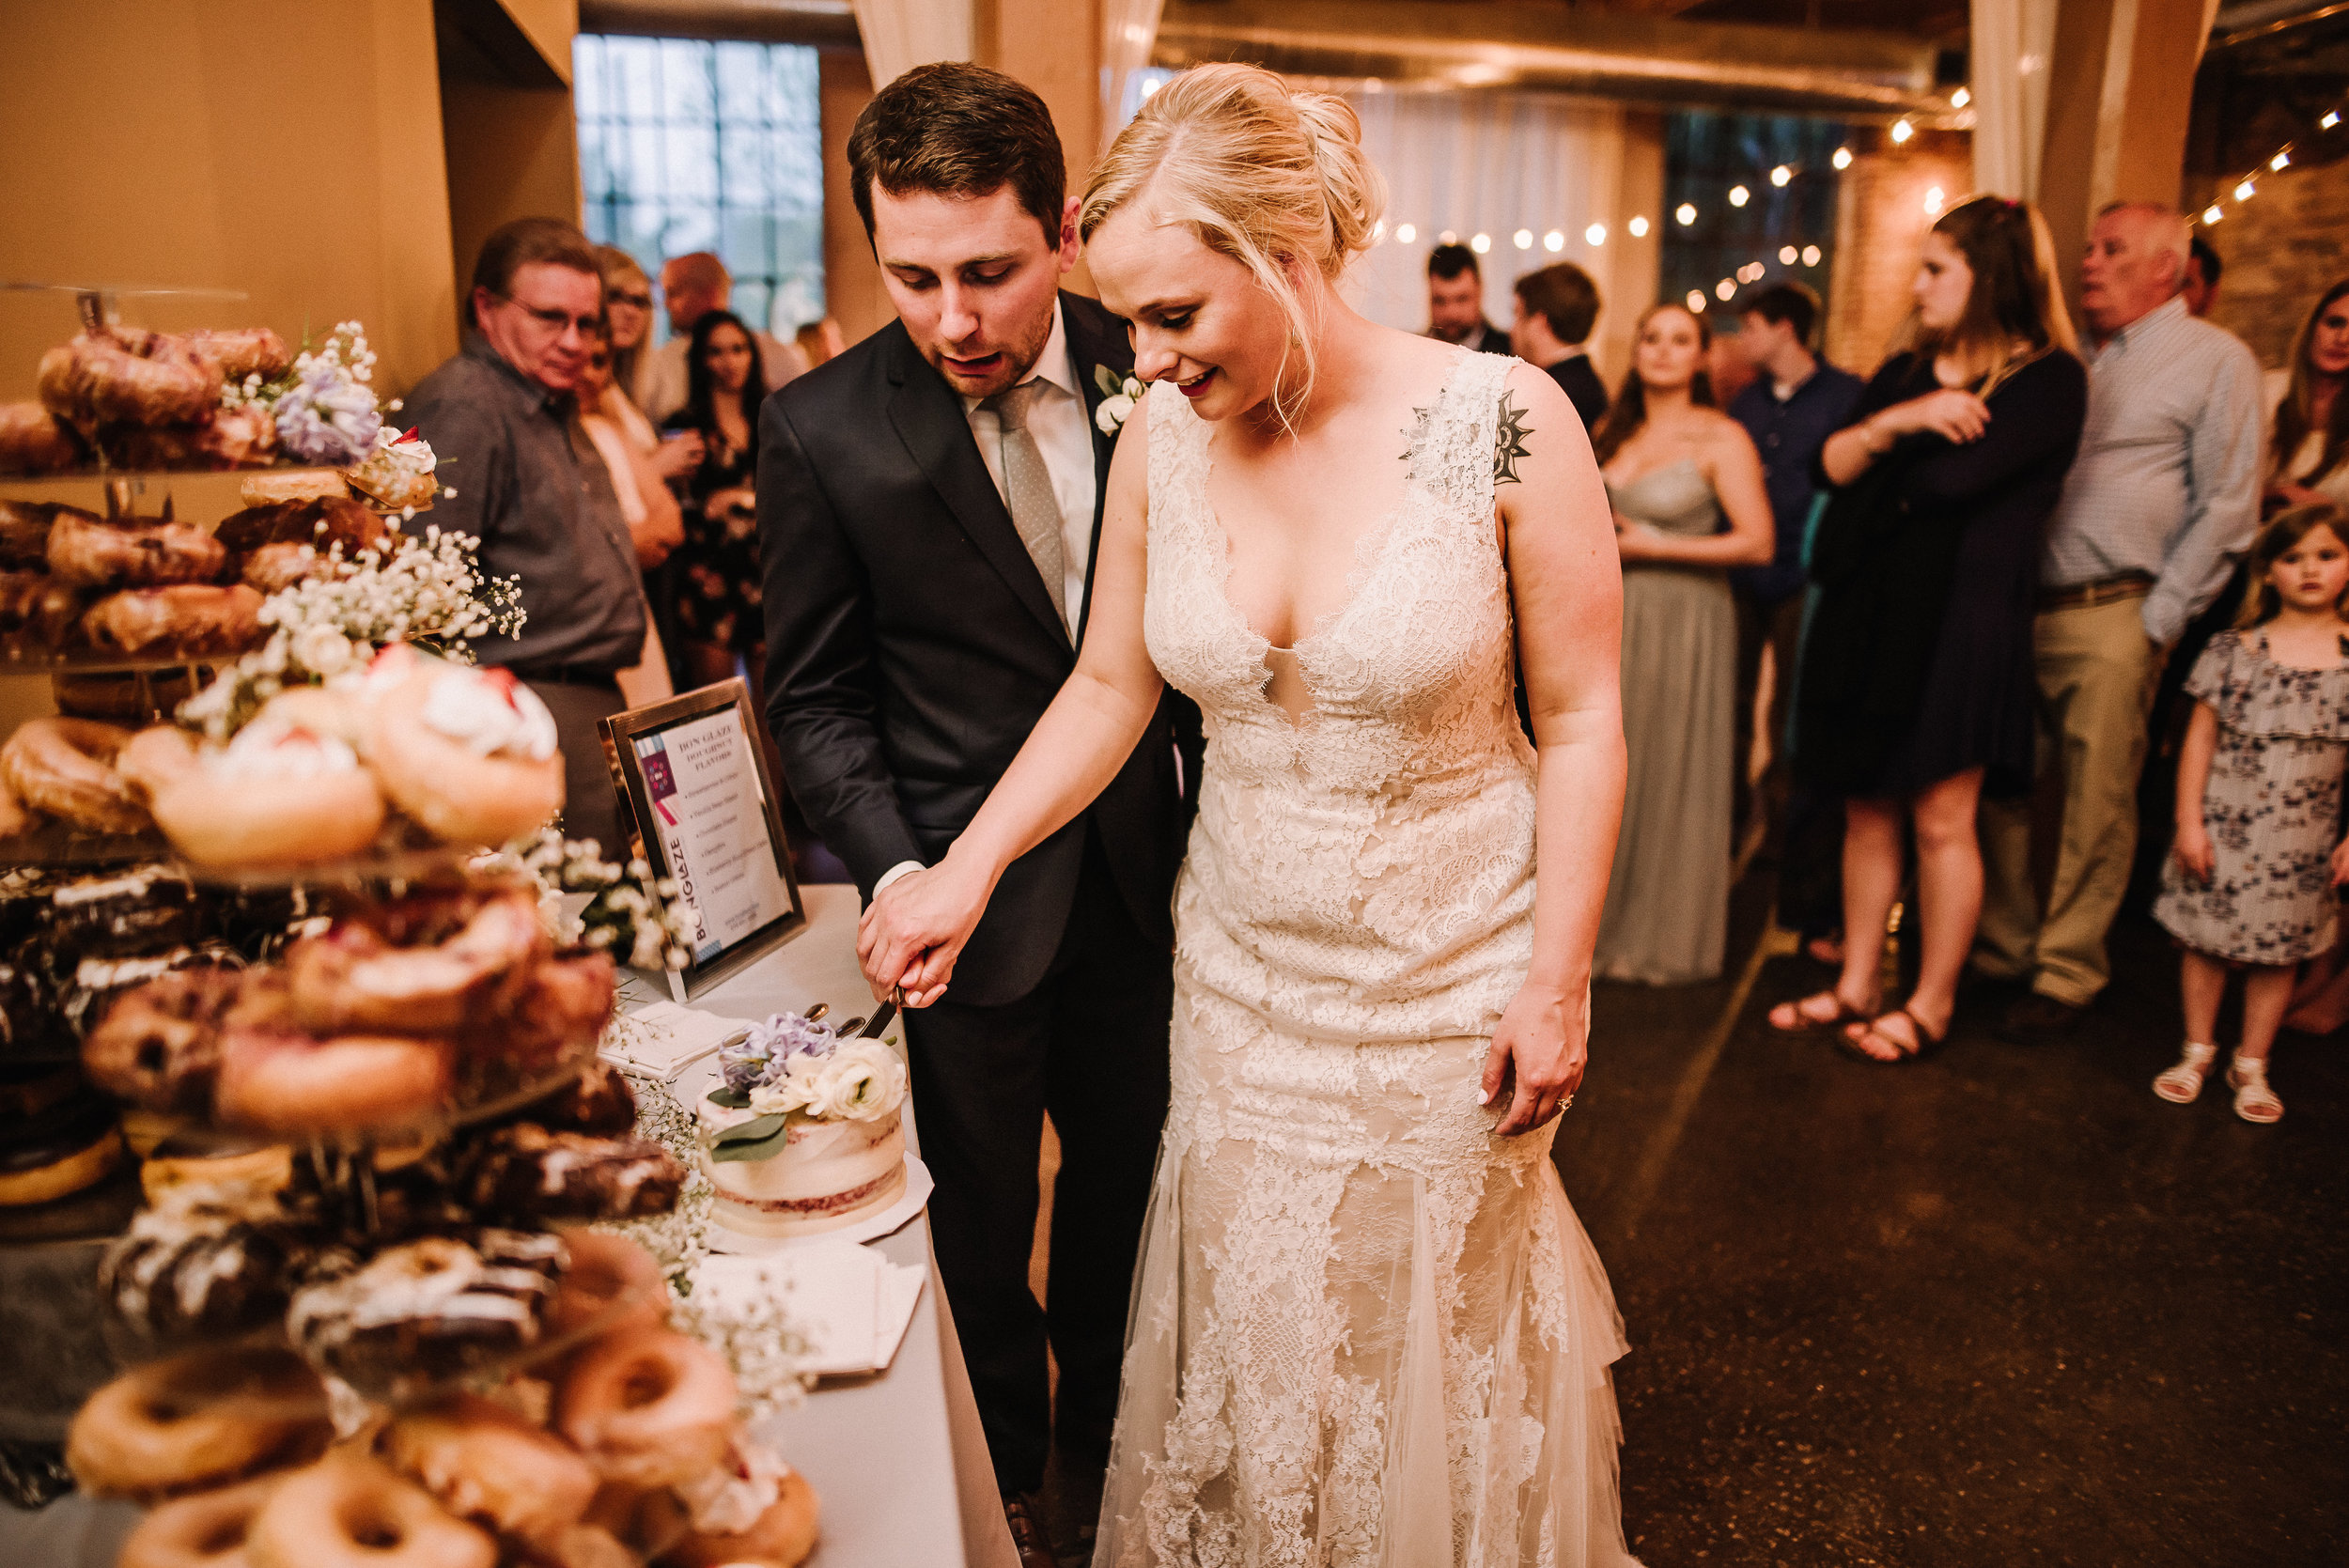 Morgan Wedding_Mill at Yellow River_Ashley Benham Photography-1083.jpg